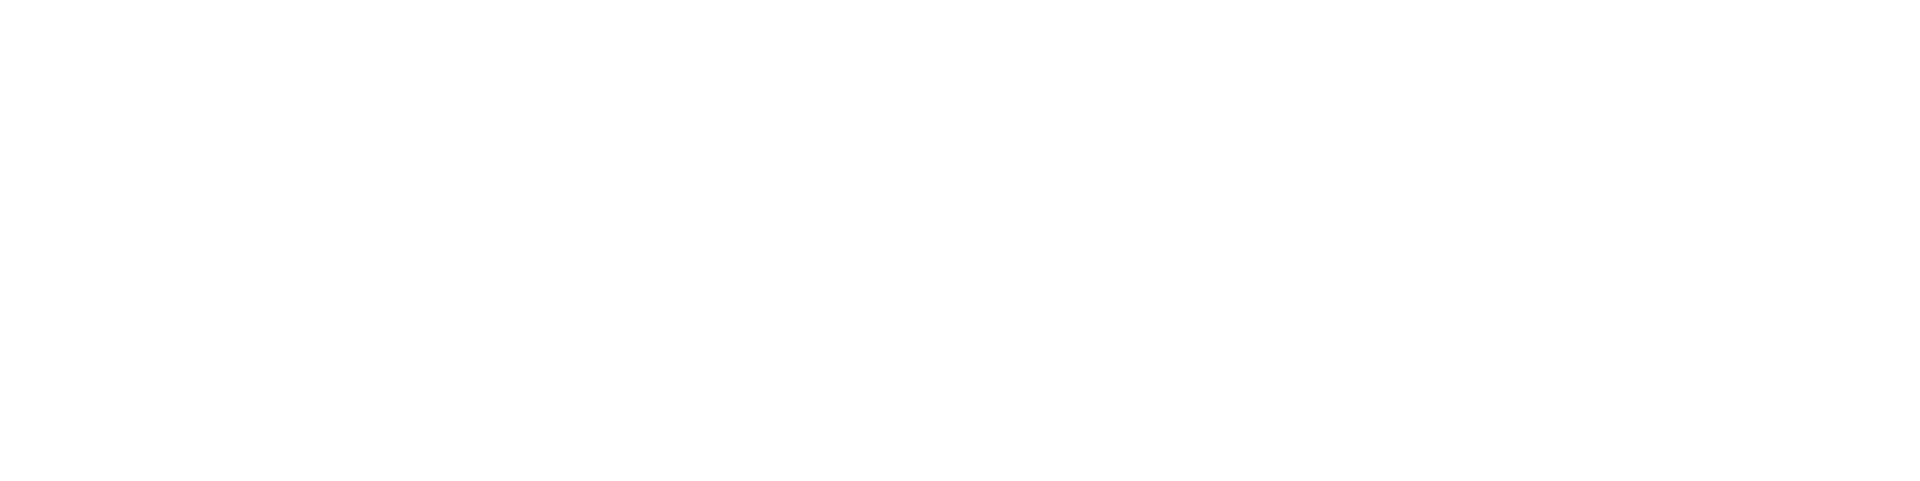 rata_foundation_logo